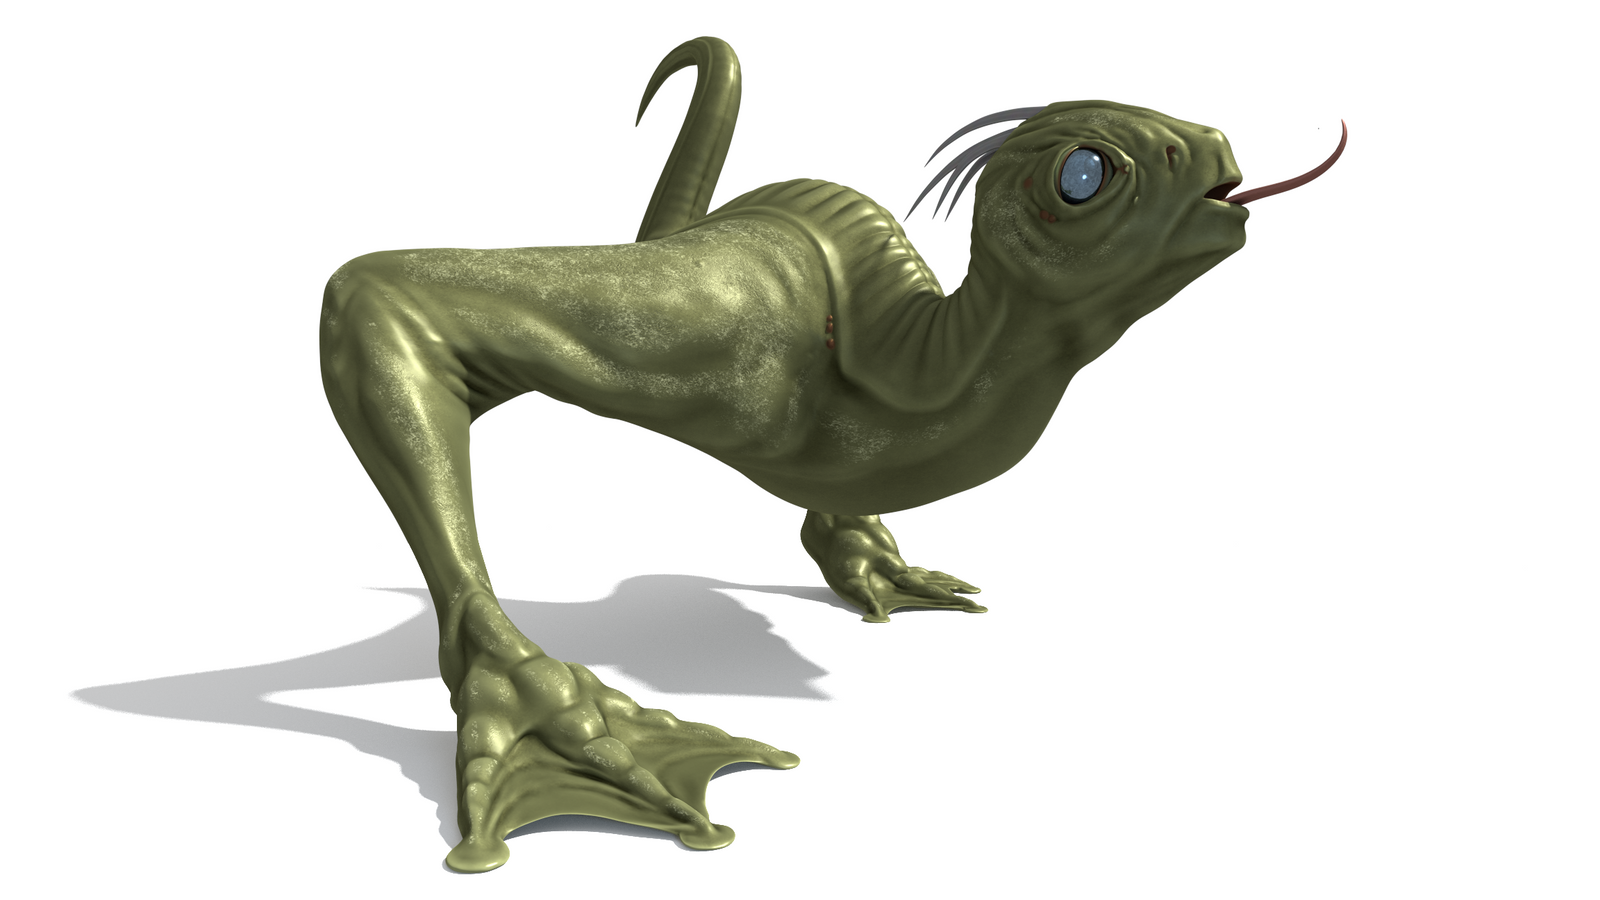 Anphib Creature Update 1 by paulrich